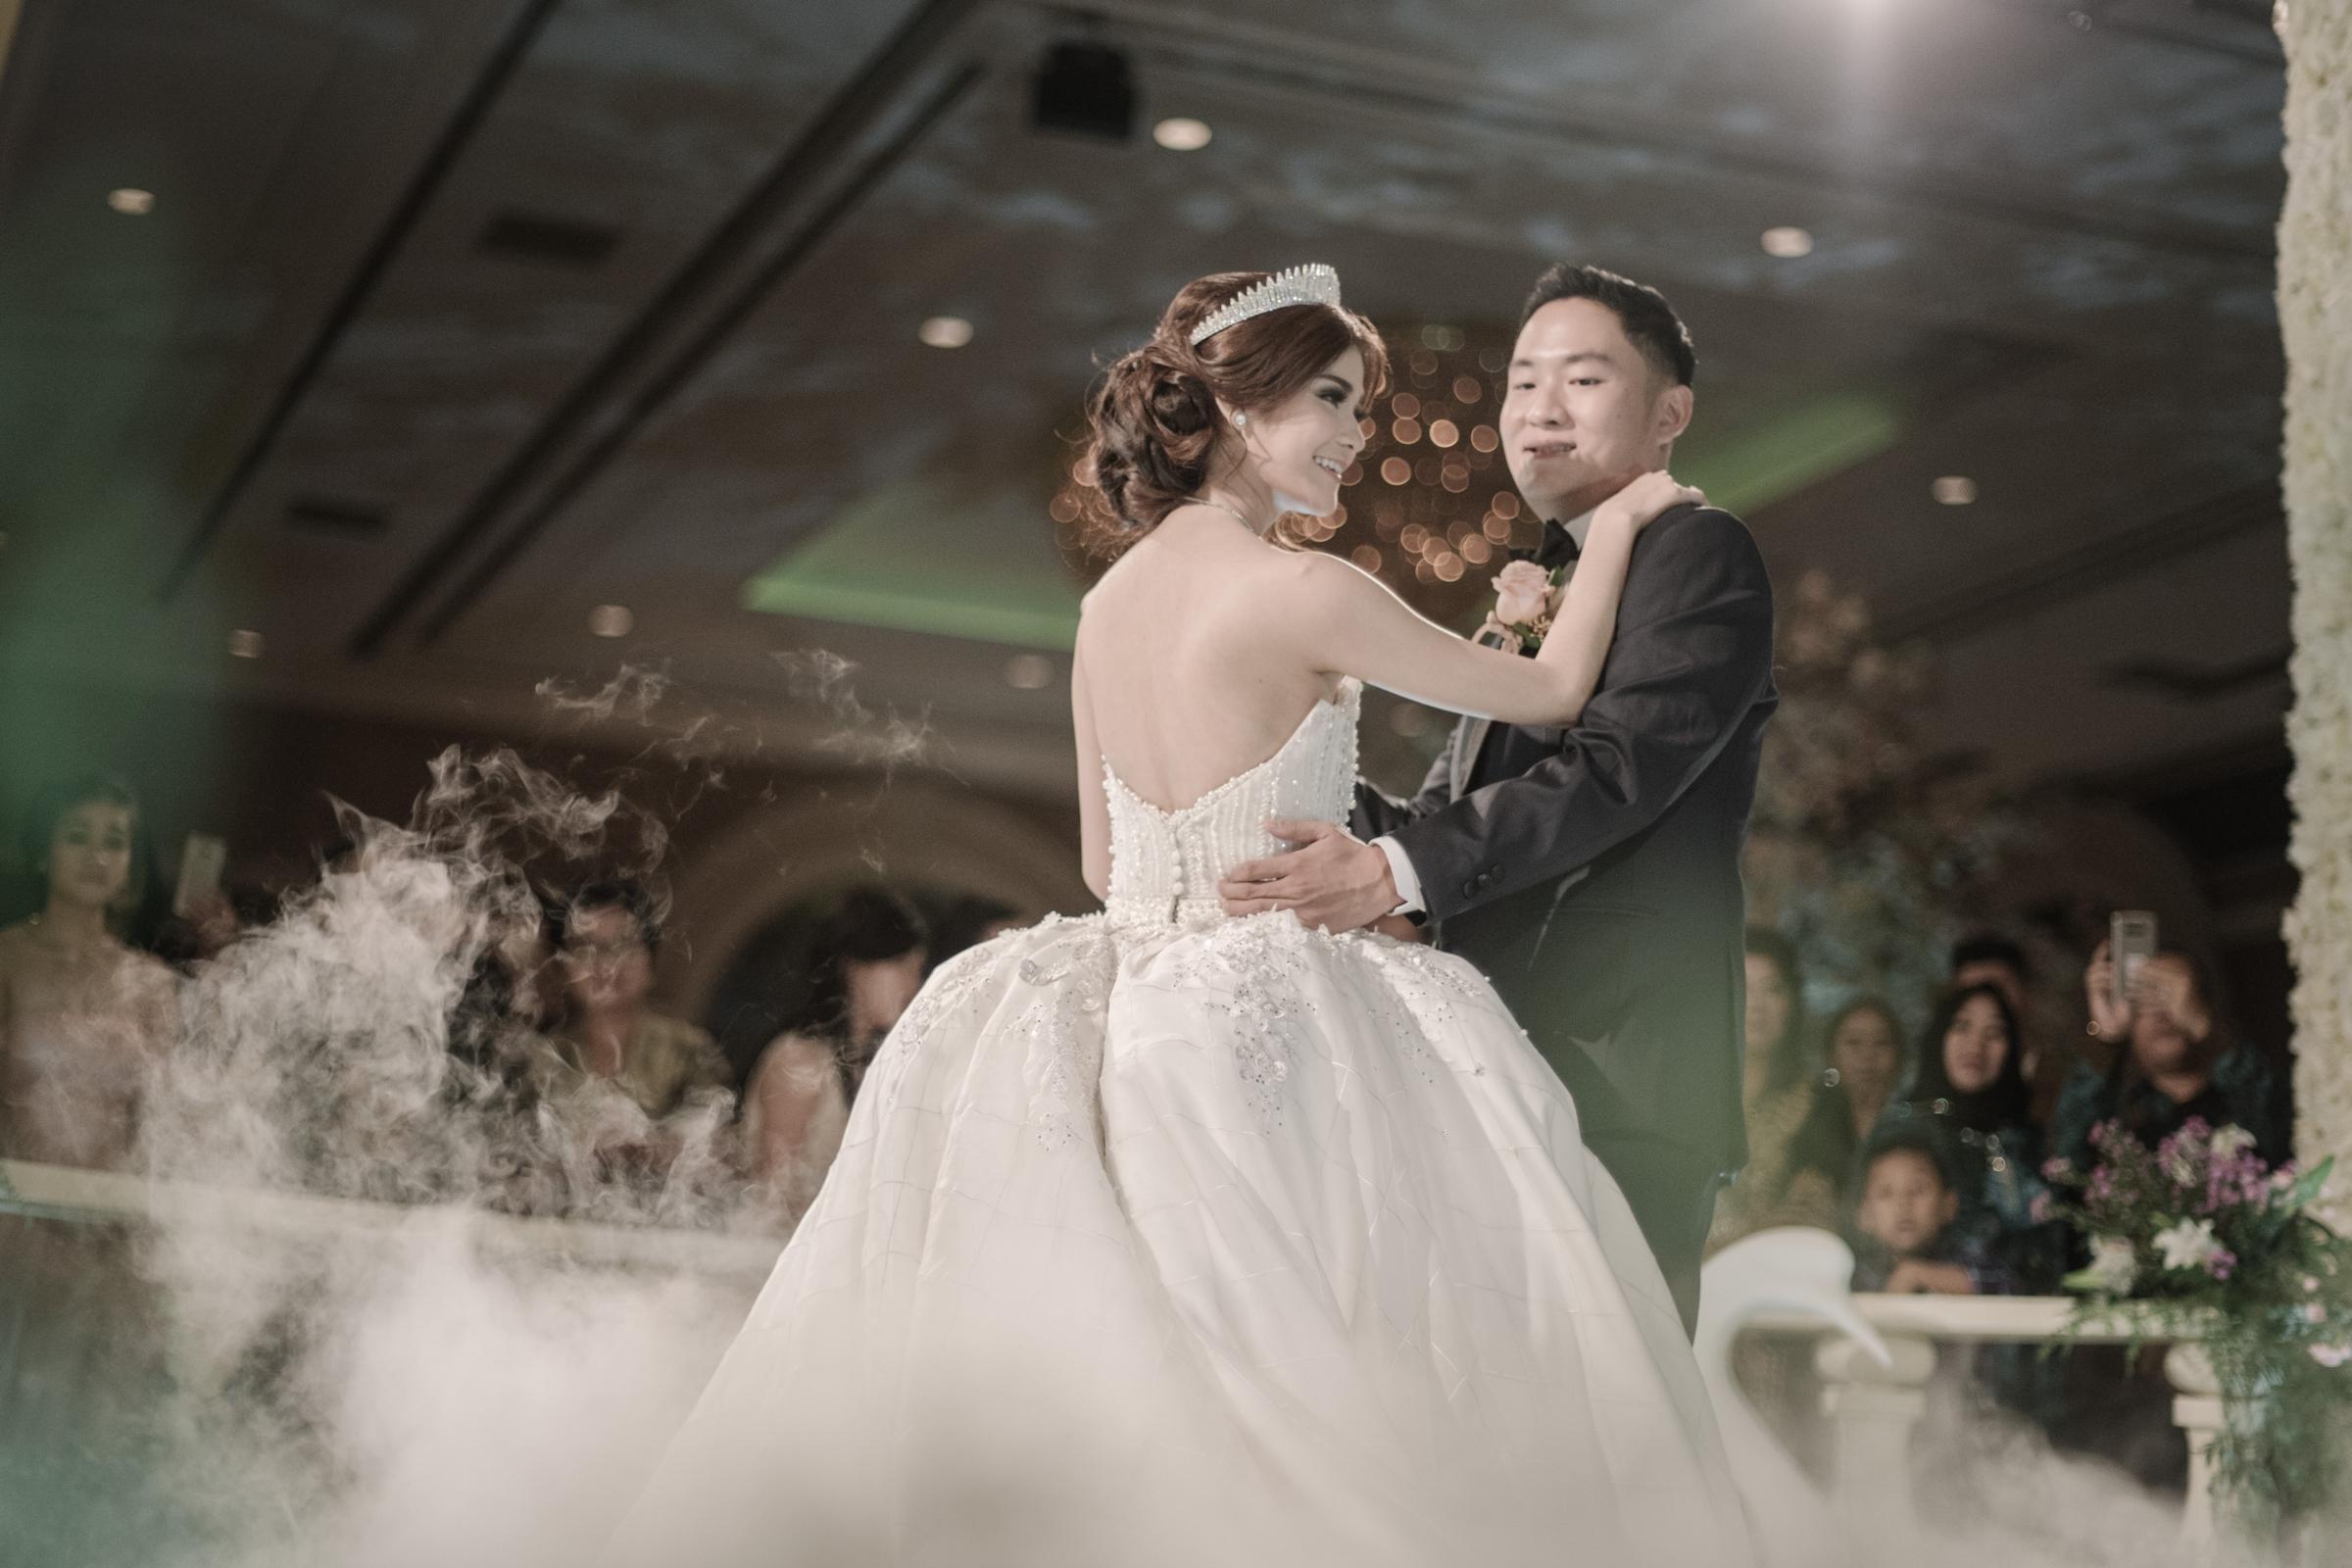 livia-reagan-wedding-raffles-jakarta-pyara-photo-gejoo 48.jpg